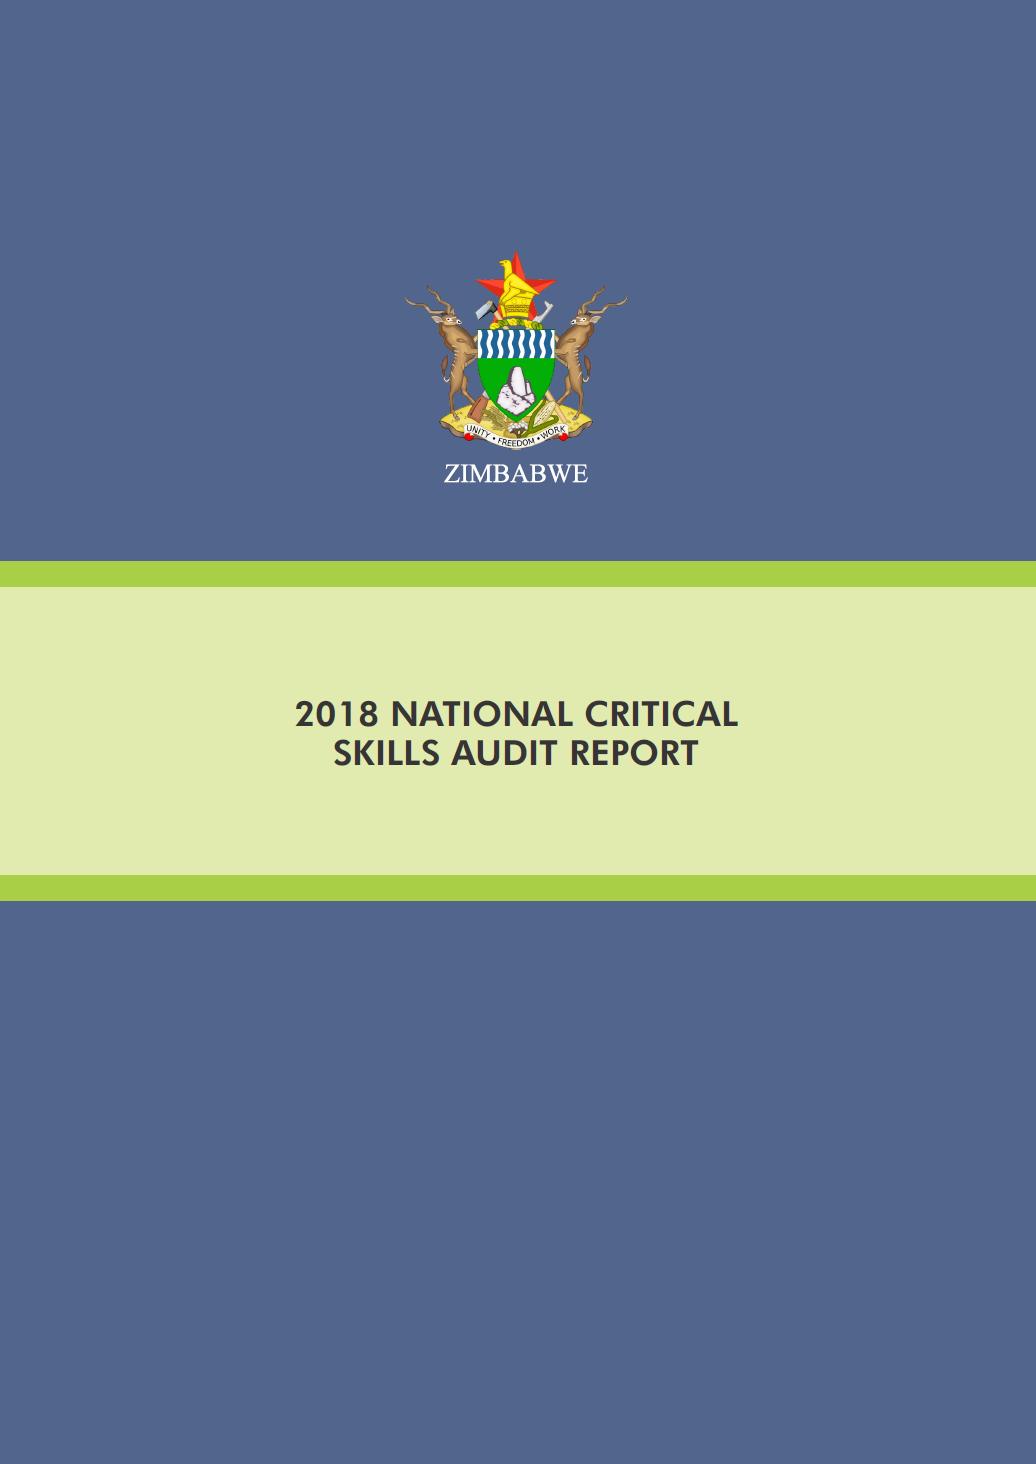 national skills audit report